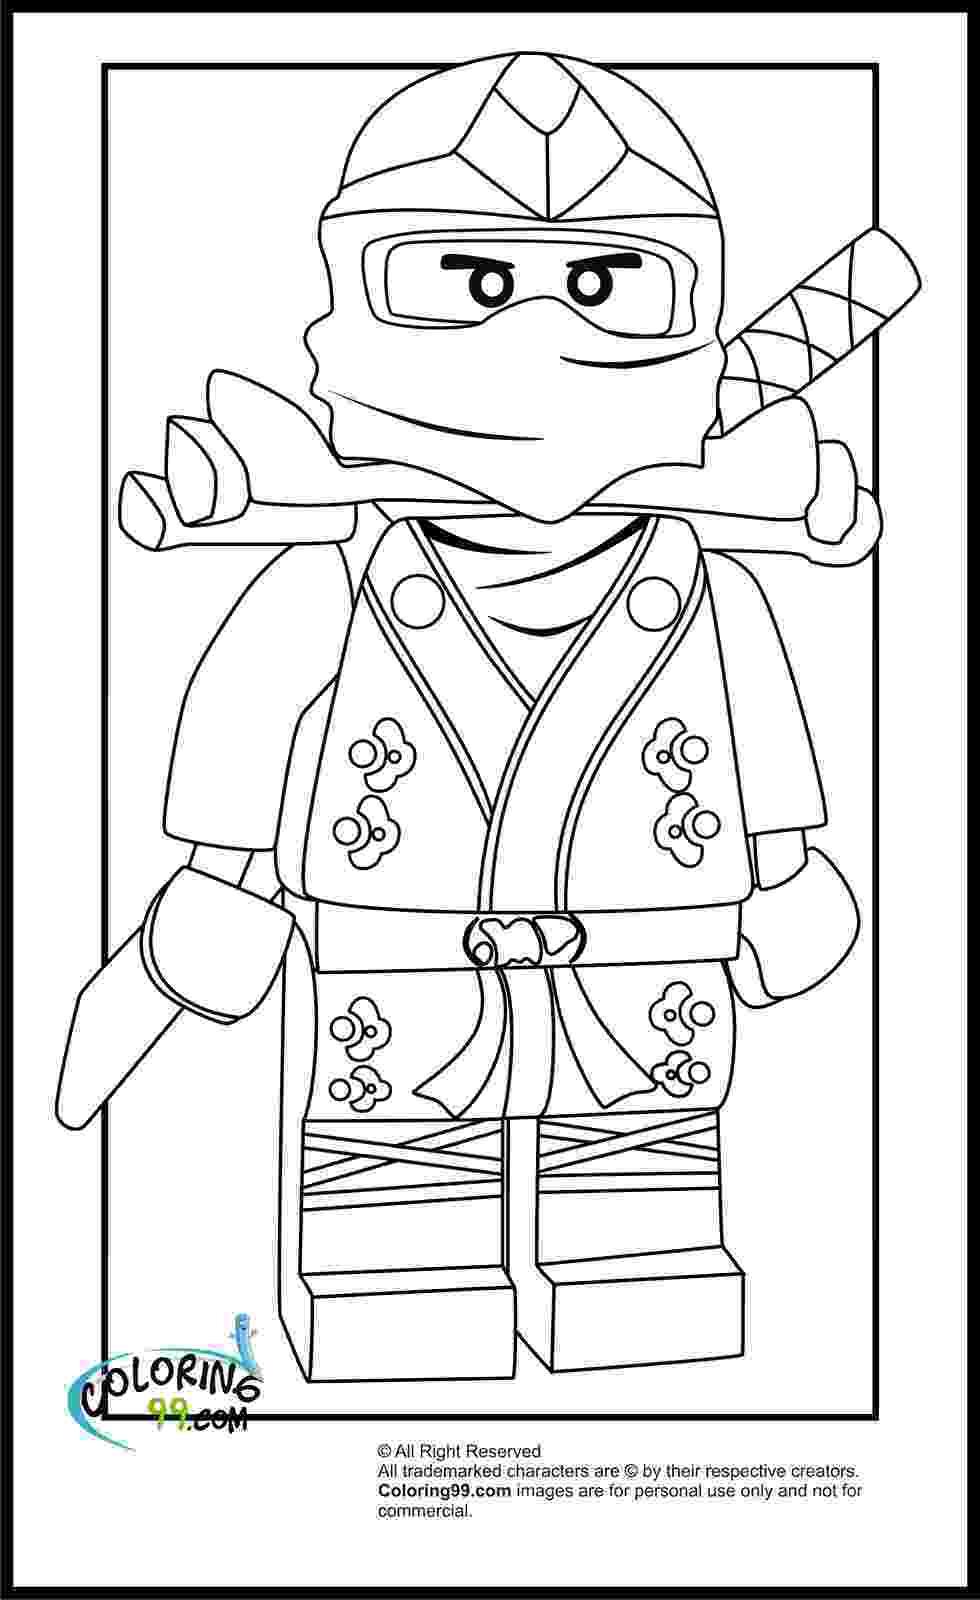 ninjago coloring sheet free printable ninjago coloring pages for kids cool2bkids sheet ninjago coloring